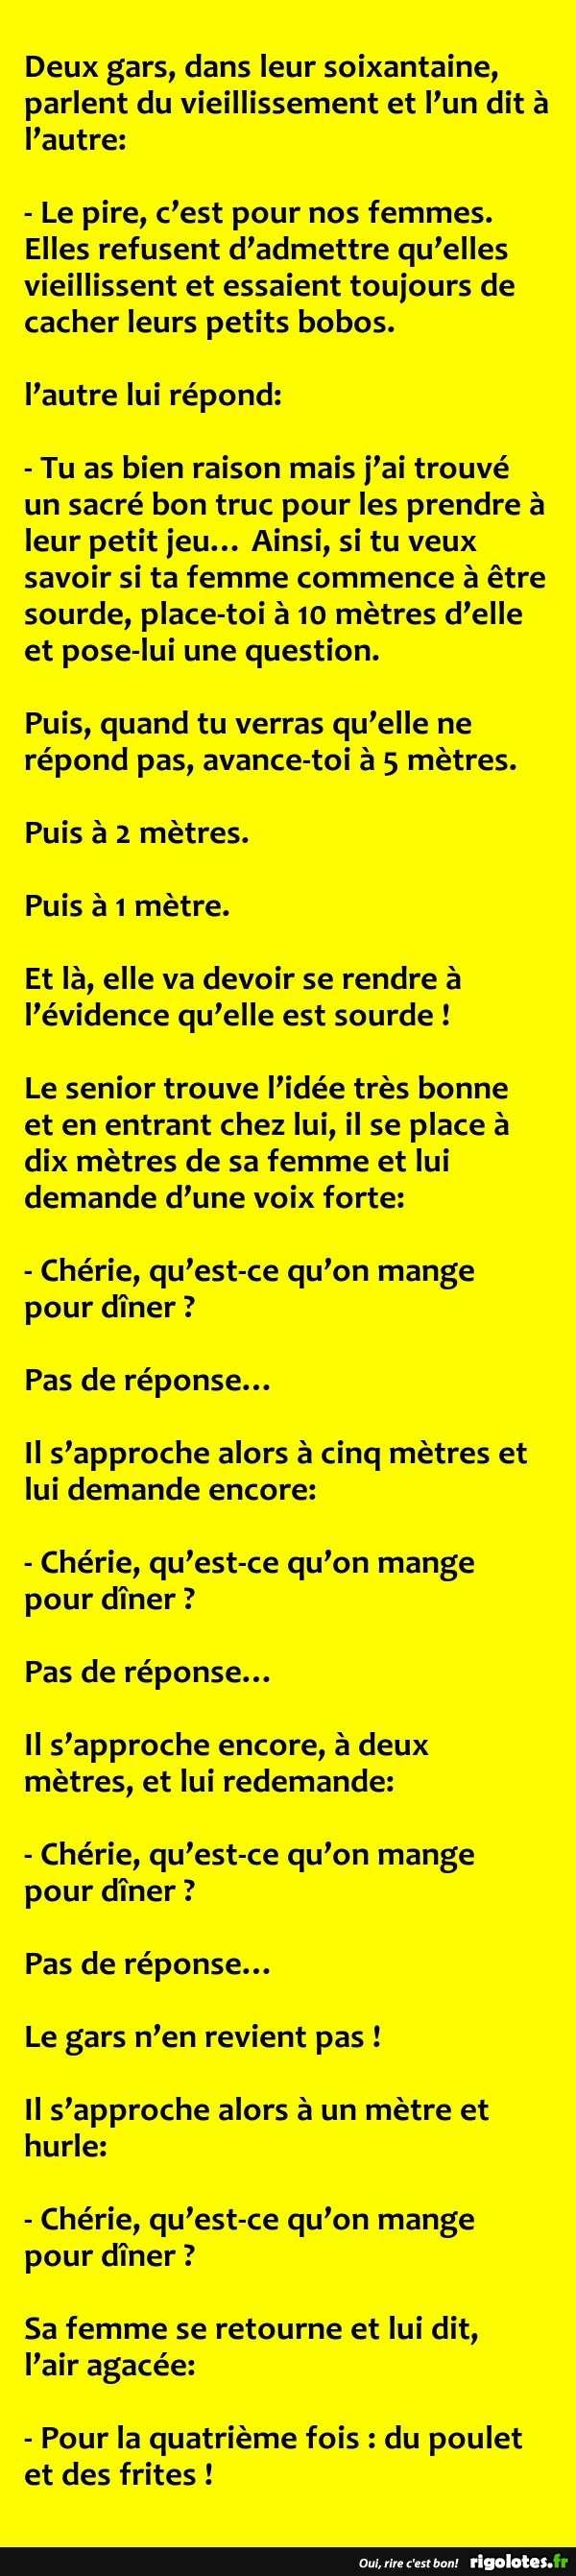 Blagues et Histoires Drôles III - Page 3 20170210